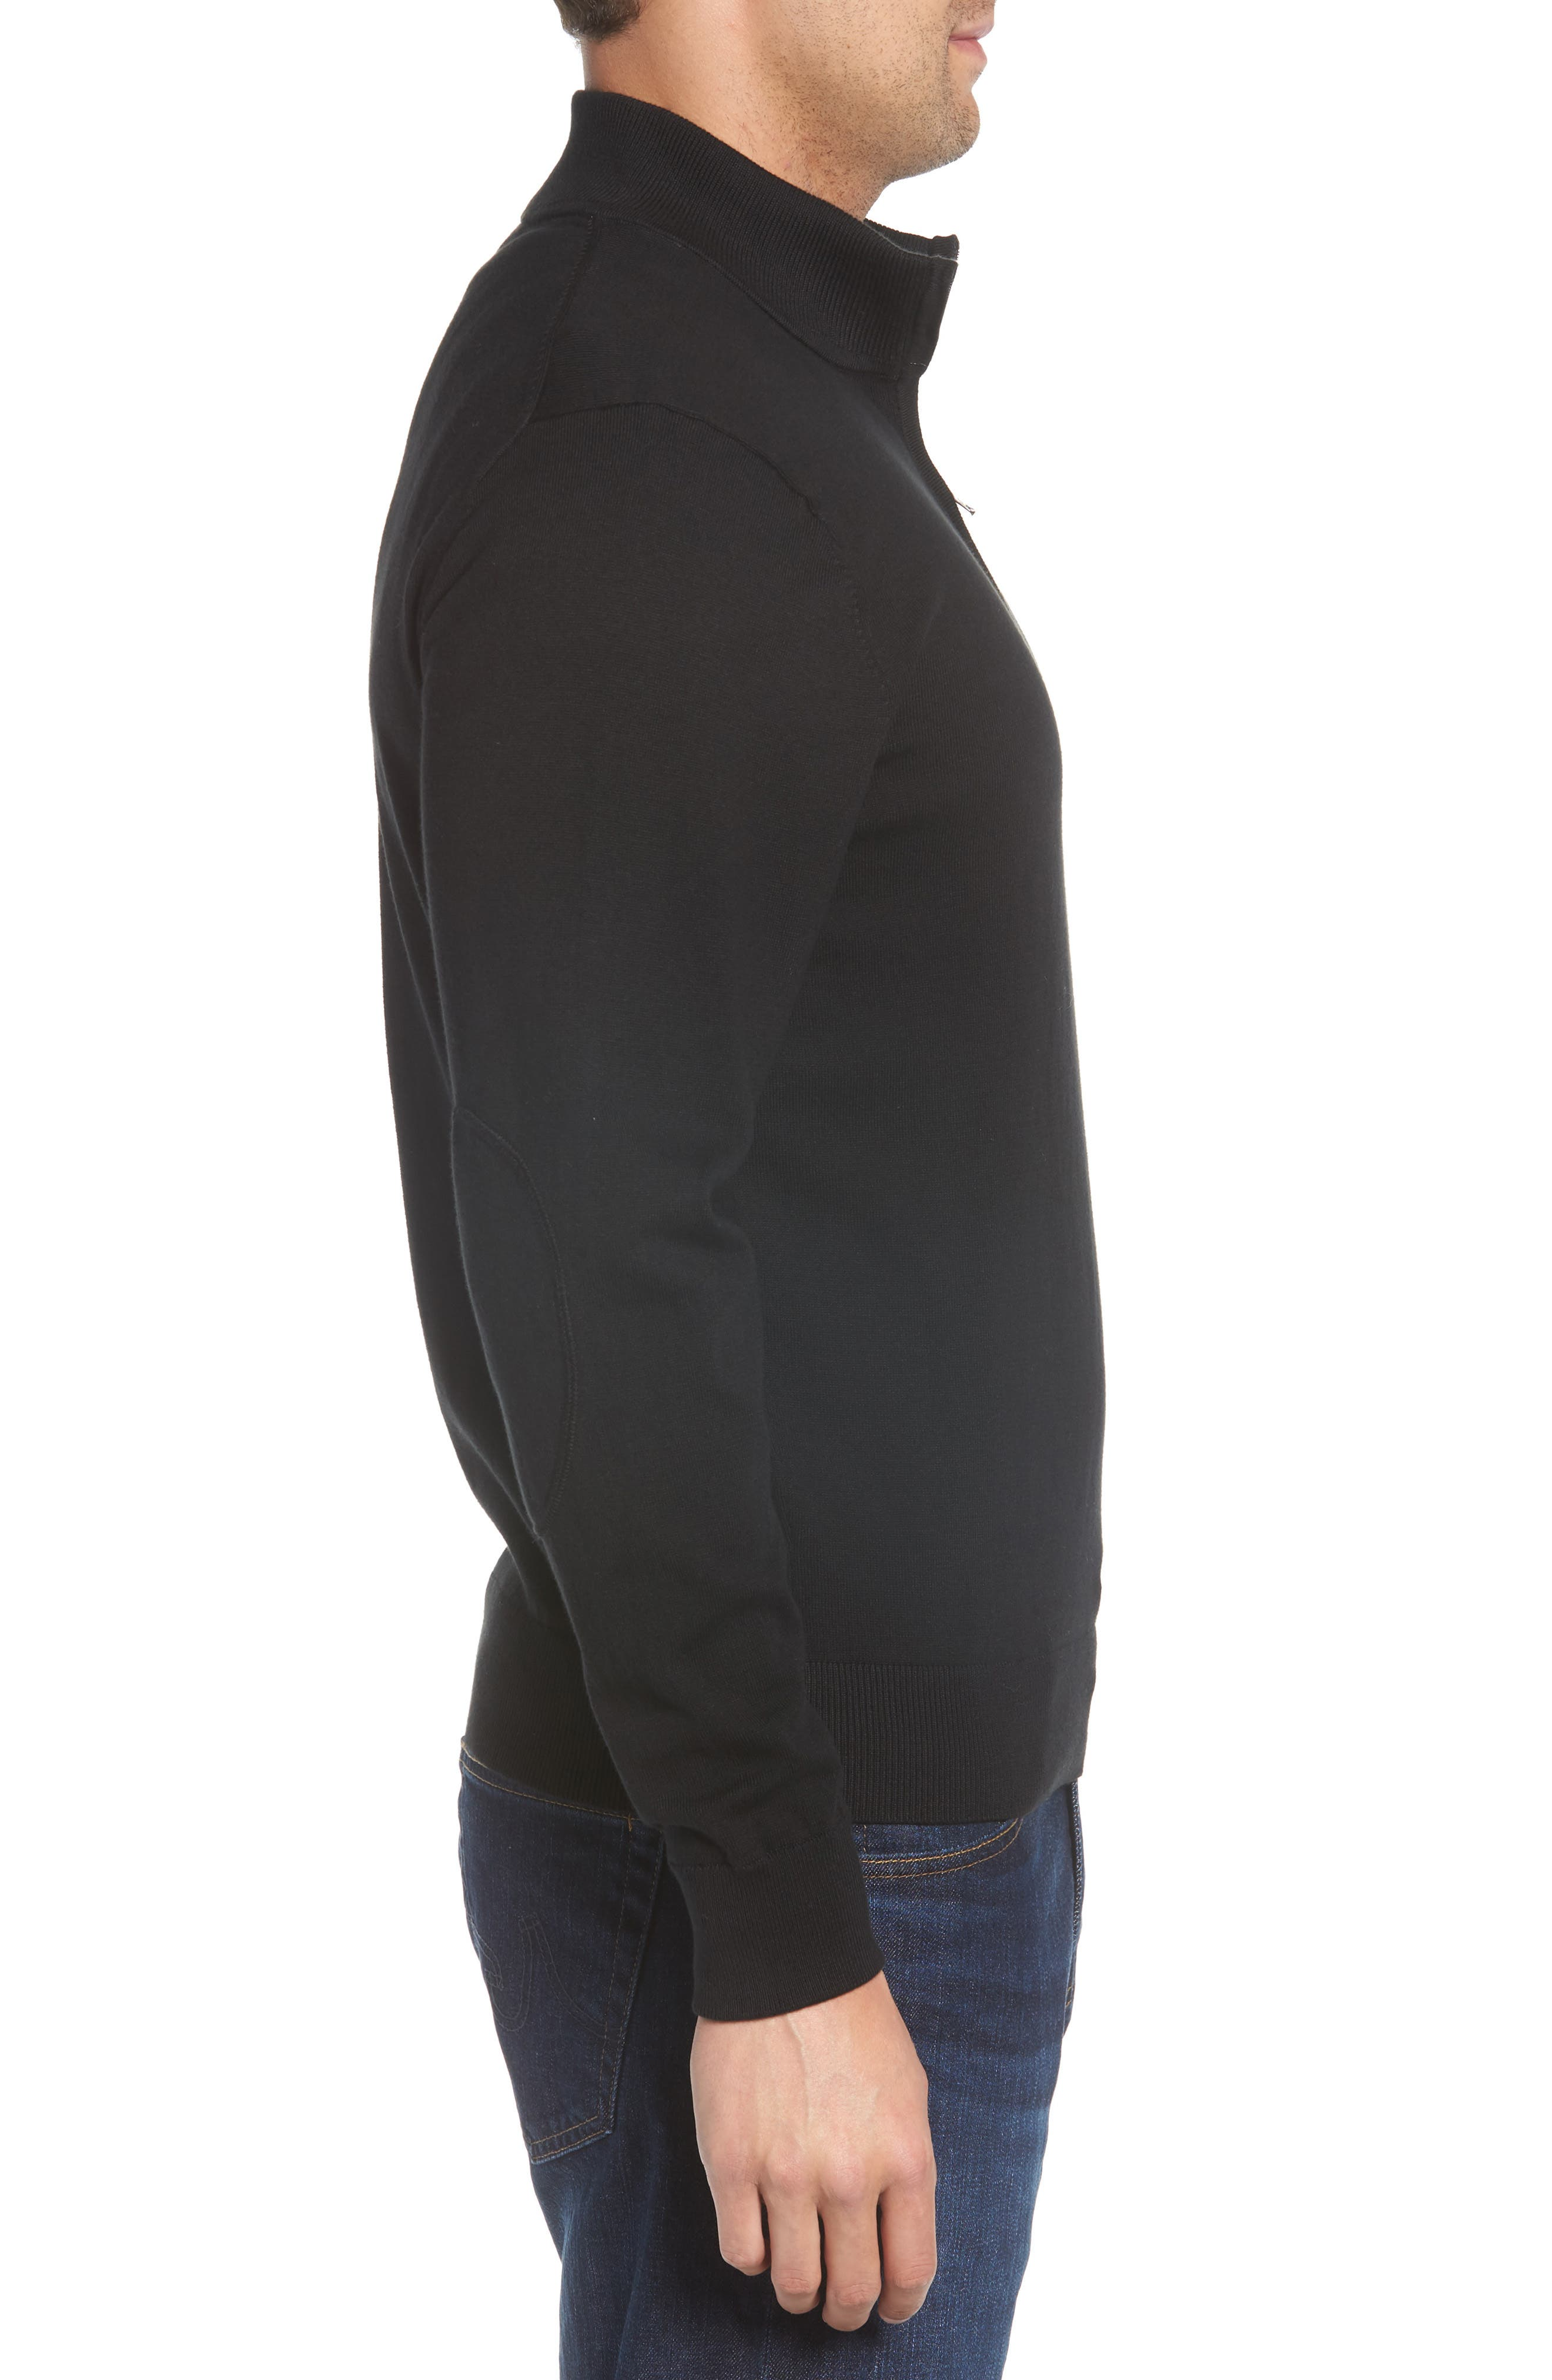 Atlanta Falcons - Lakemont Regular Fit Quarter Zip Sweater,                             Alternate thumbnail 3, color,                             BLACK